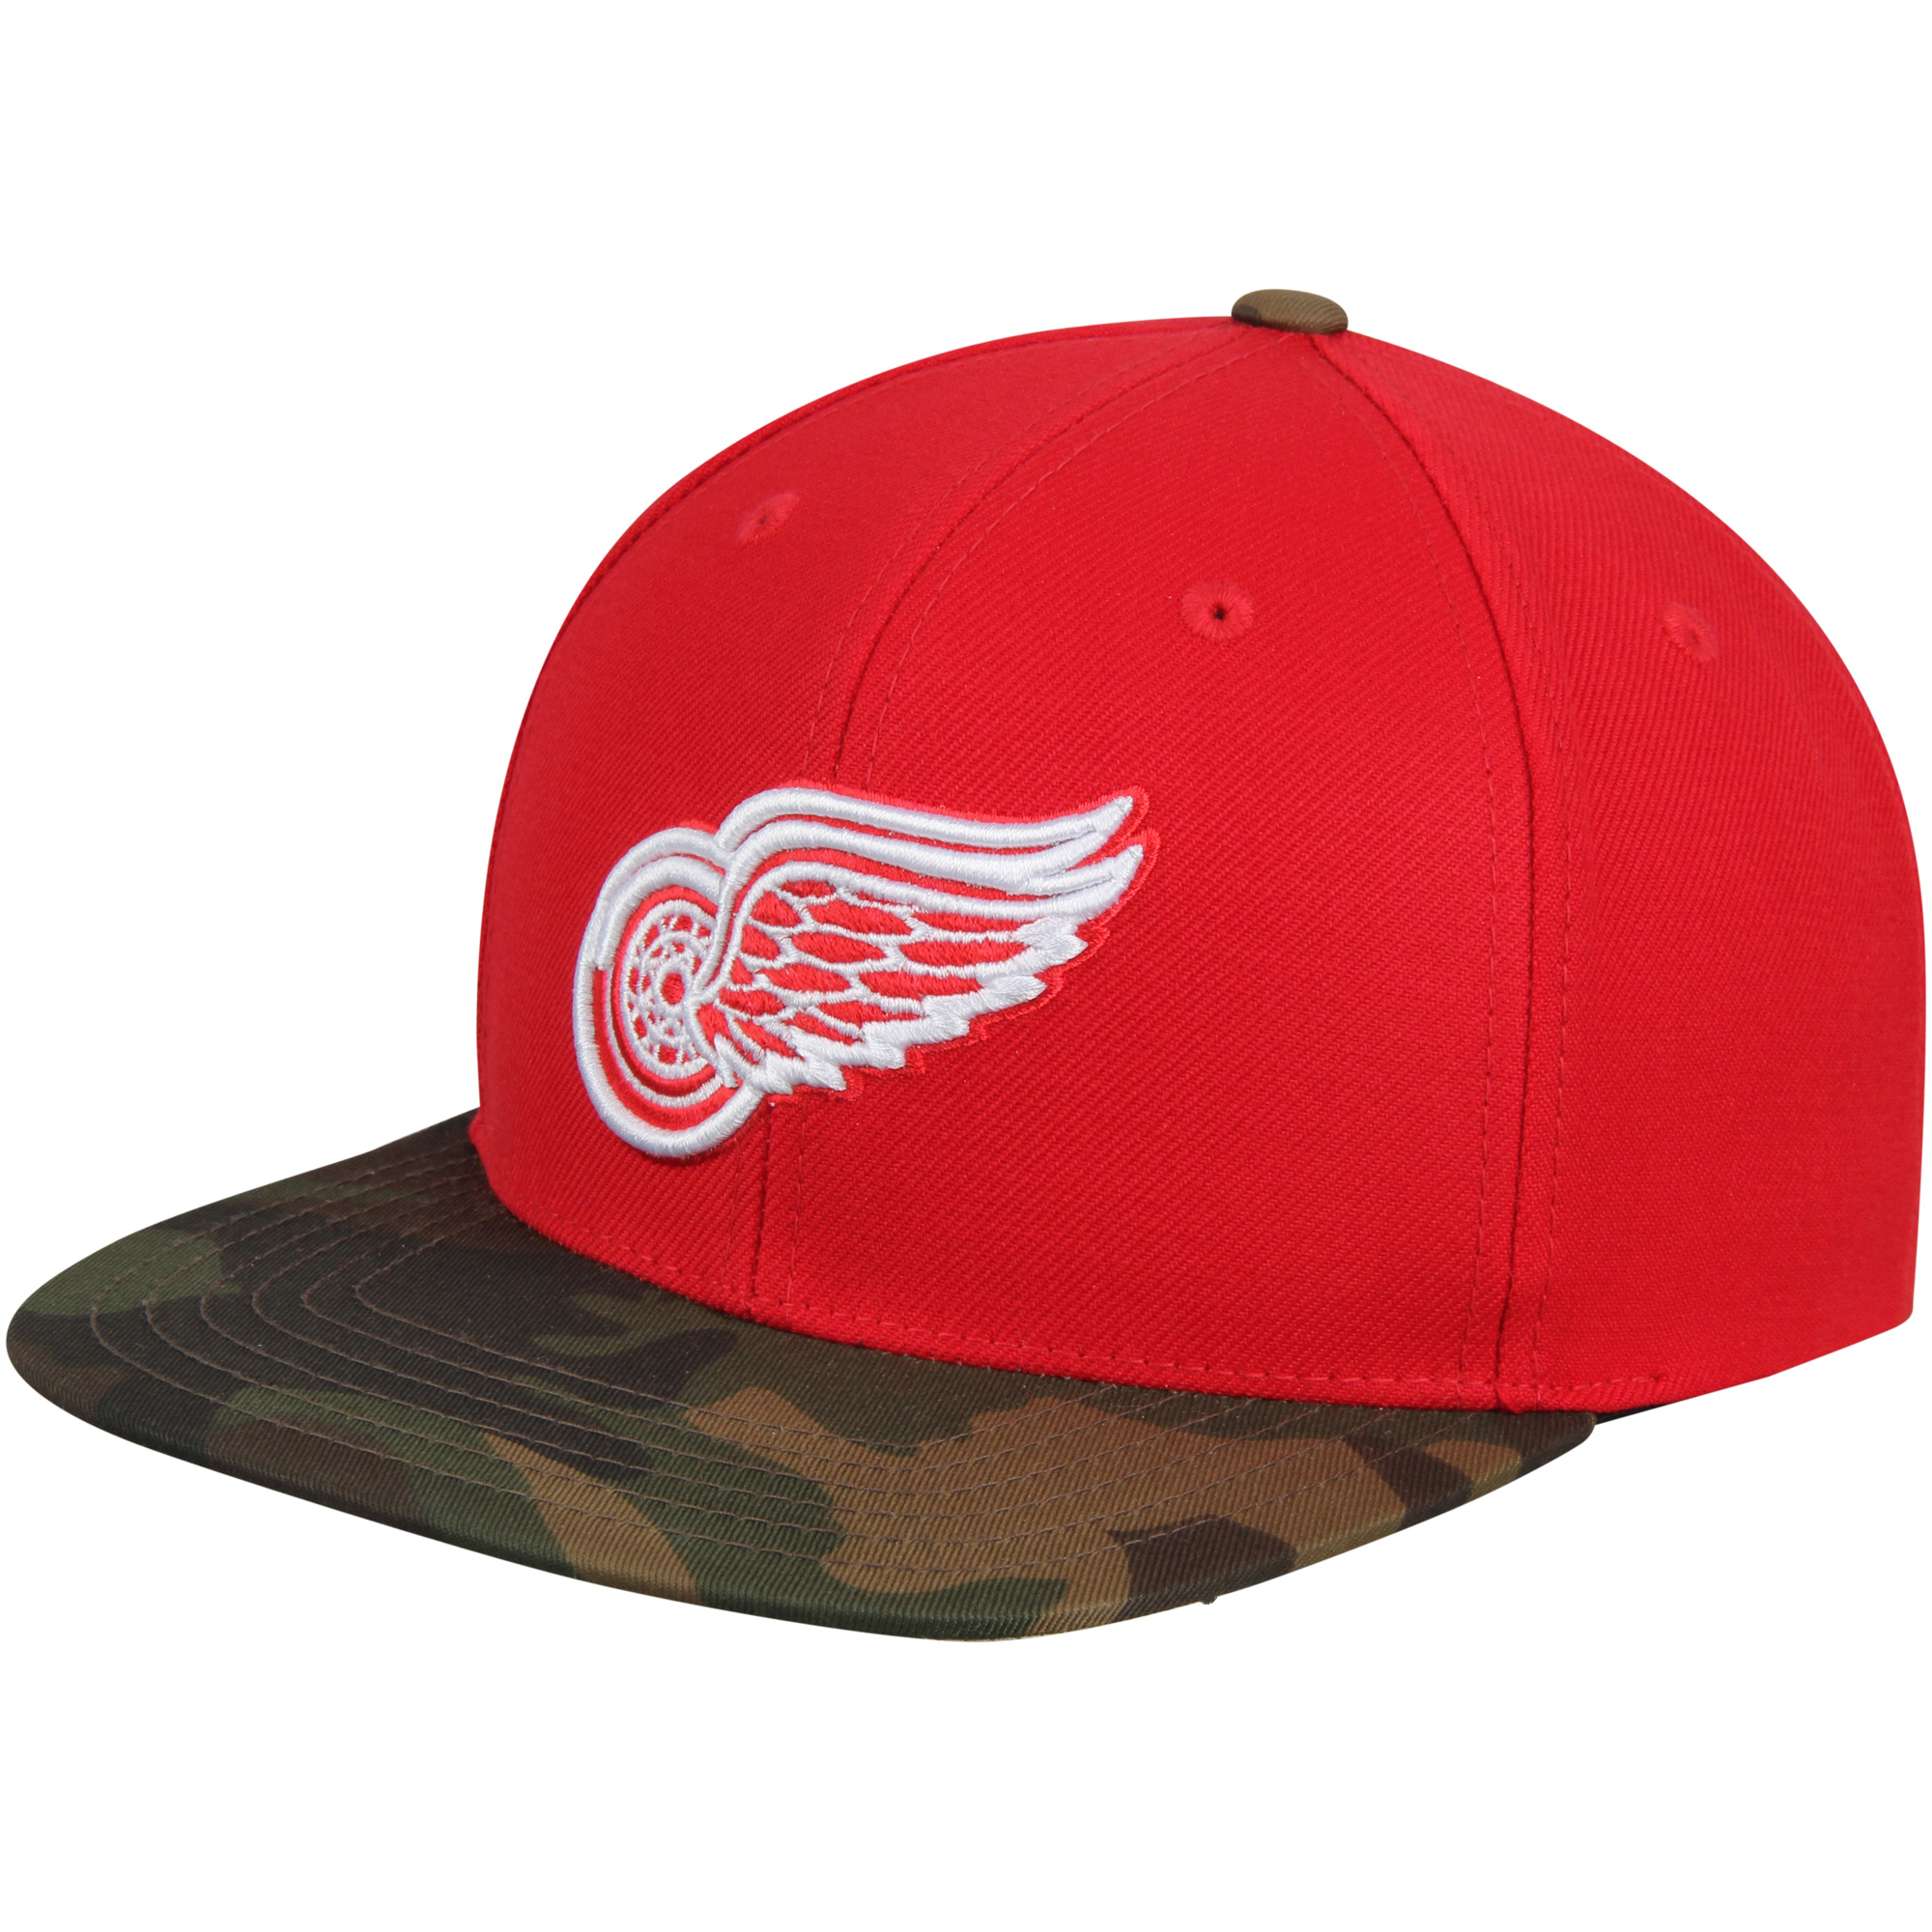 Detroit Red Wings American Needle Sundown Snapback Adjustable Hat - Red - OSFA